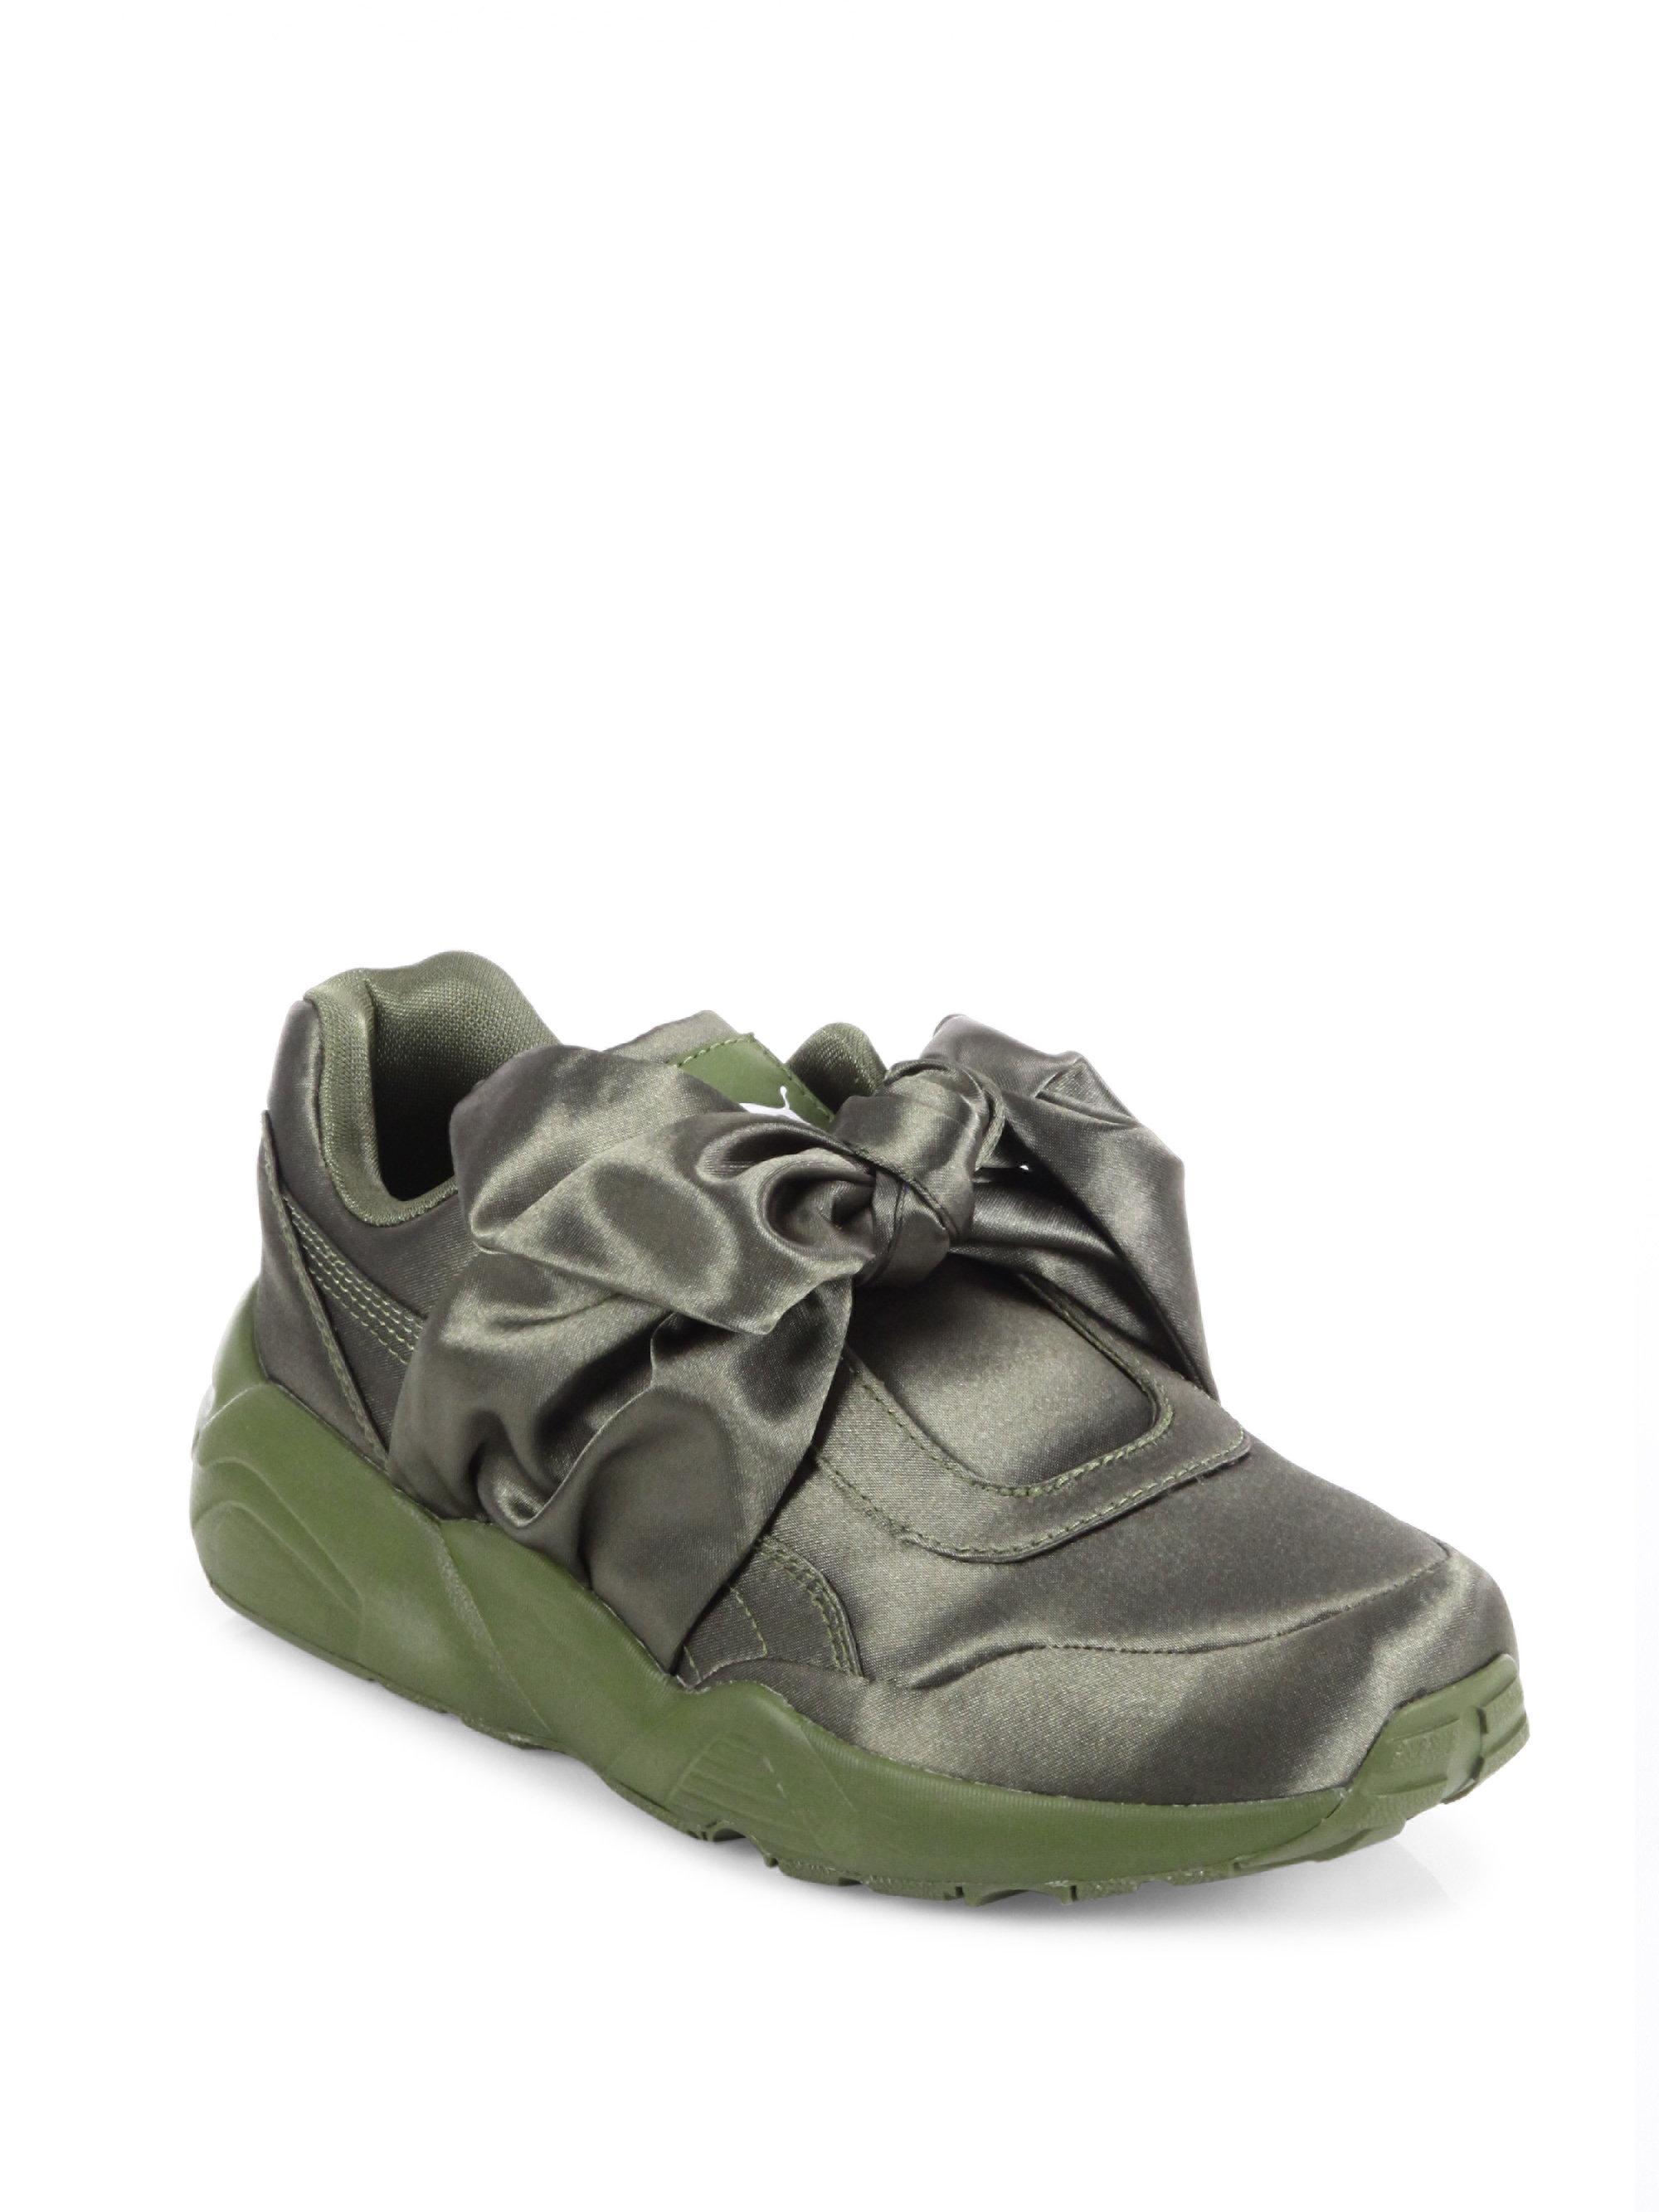 Puma Fenty X Rihanna Satin Bow Sneakers In Green Lyst